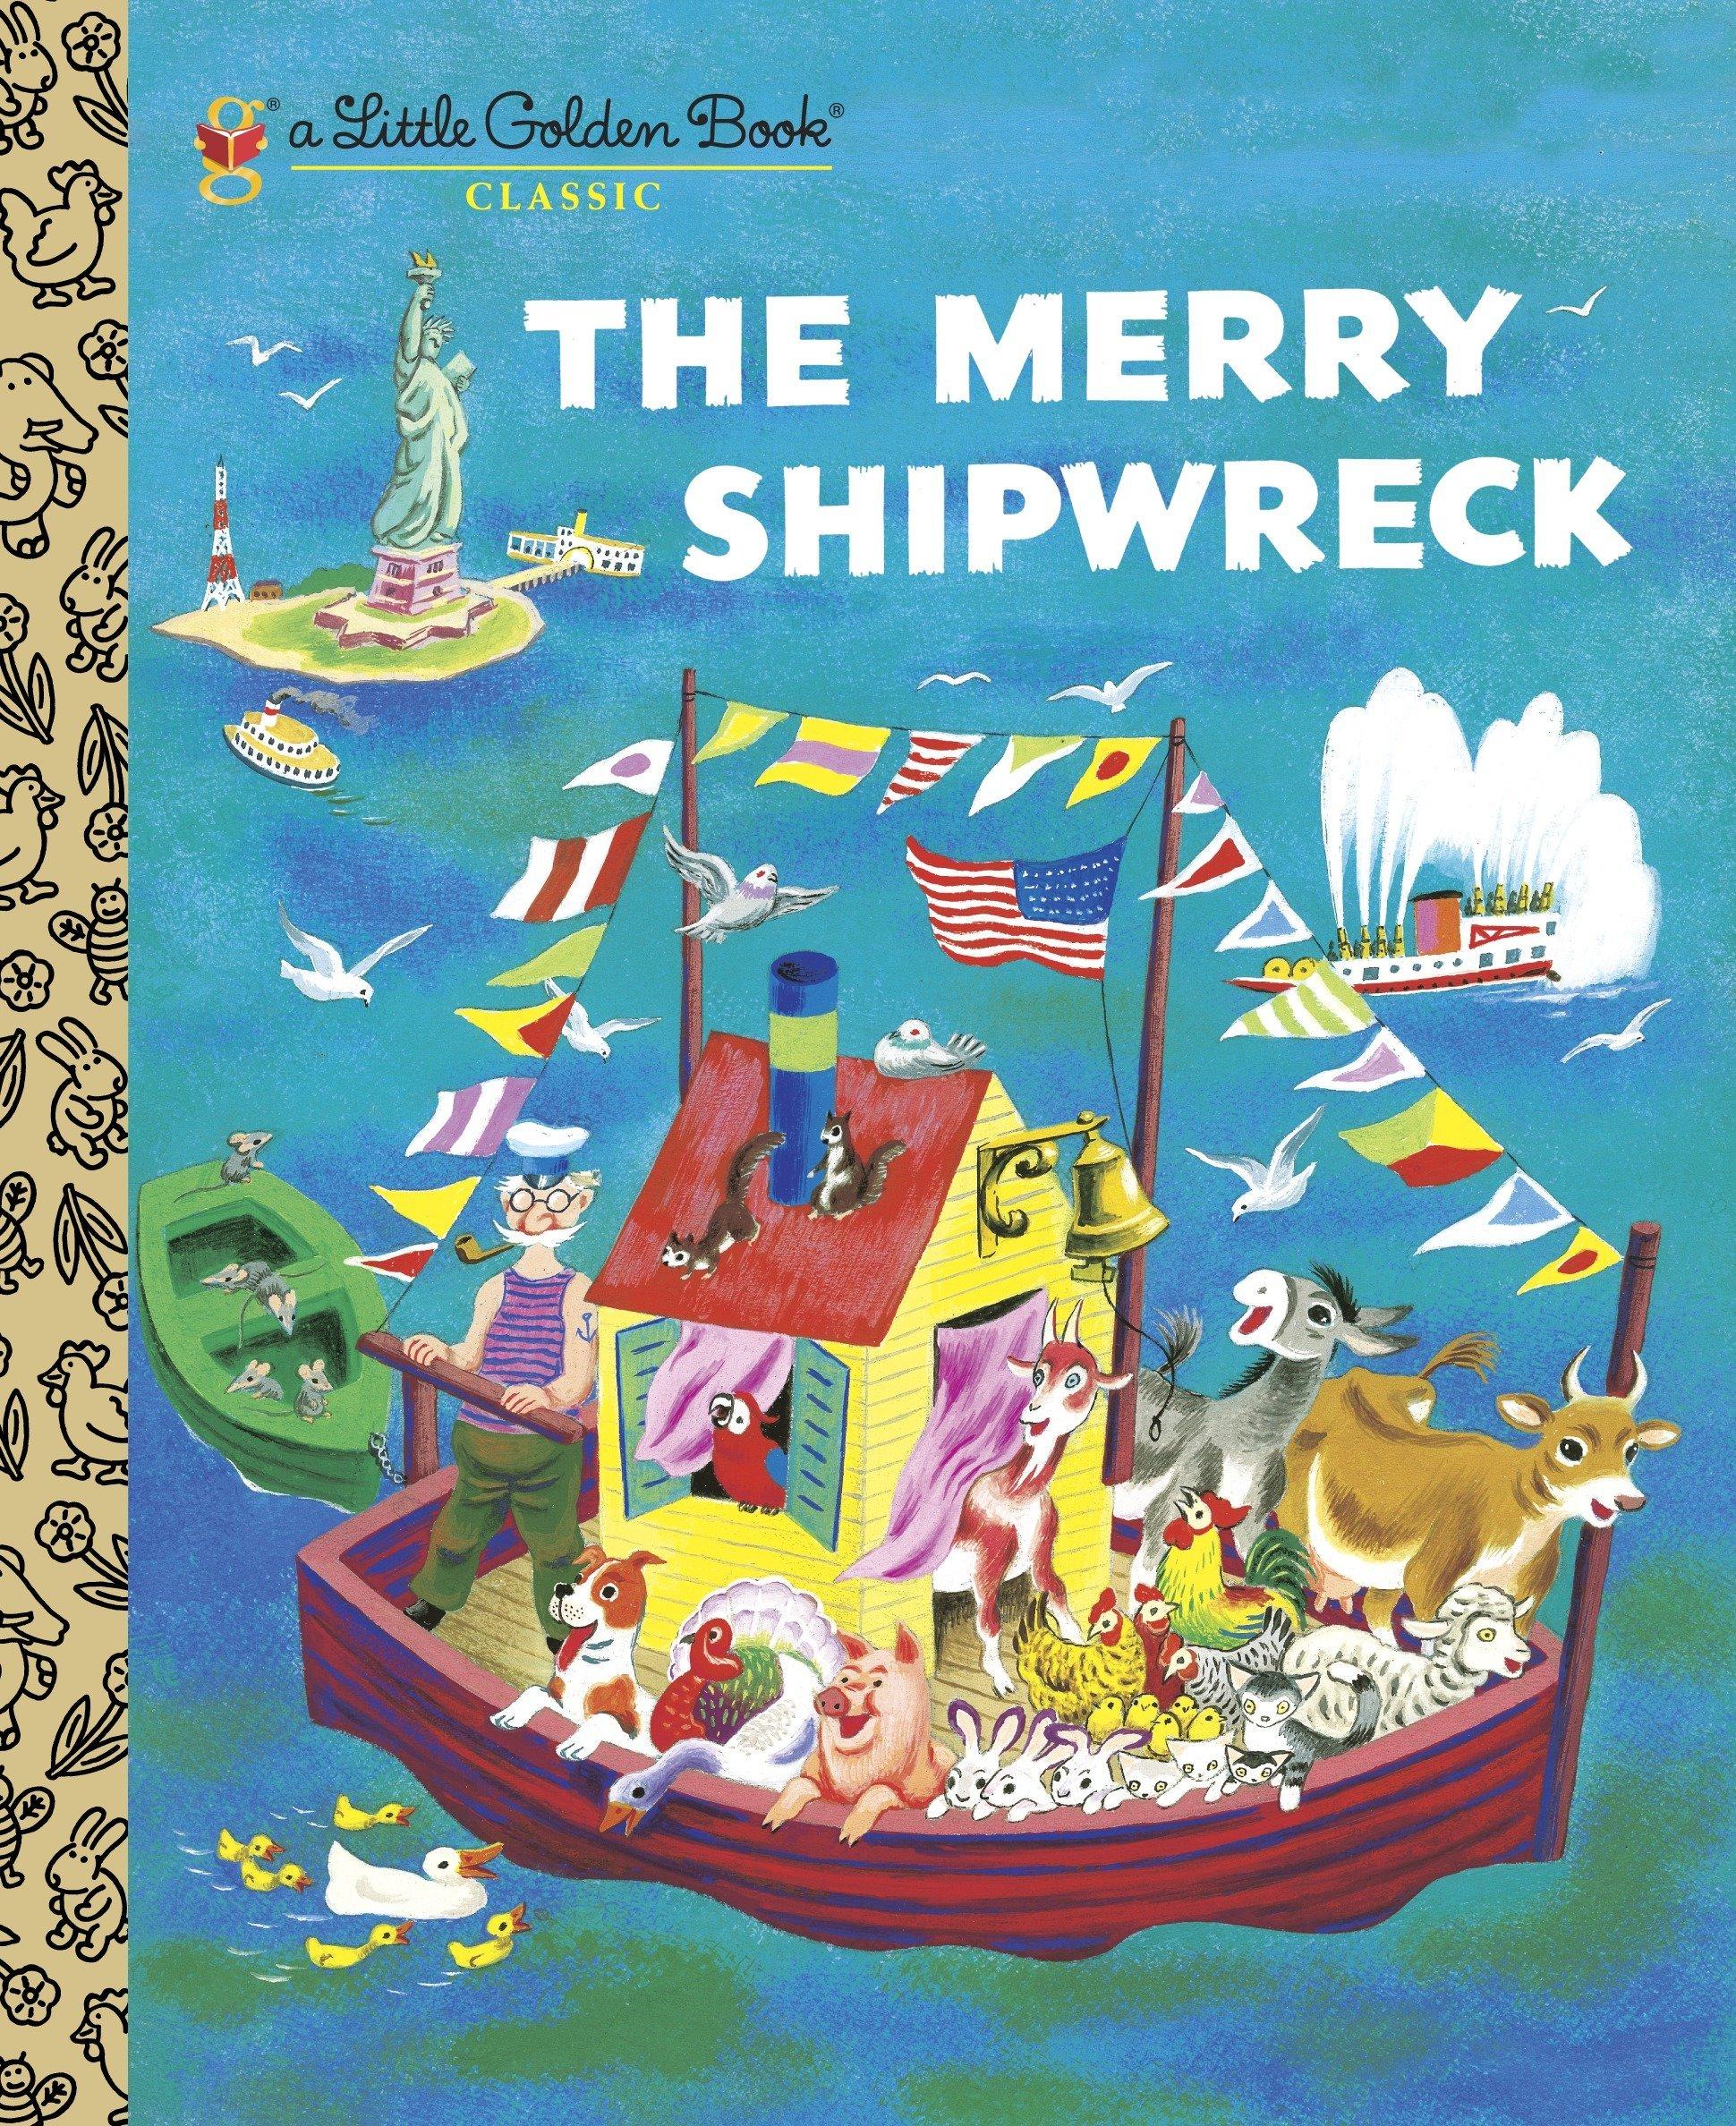 The Merry Shipwreck (Little Golden Book Classic)